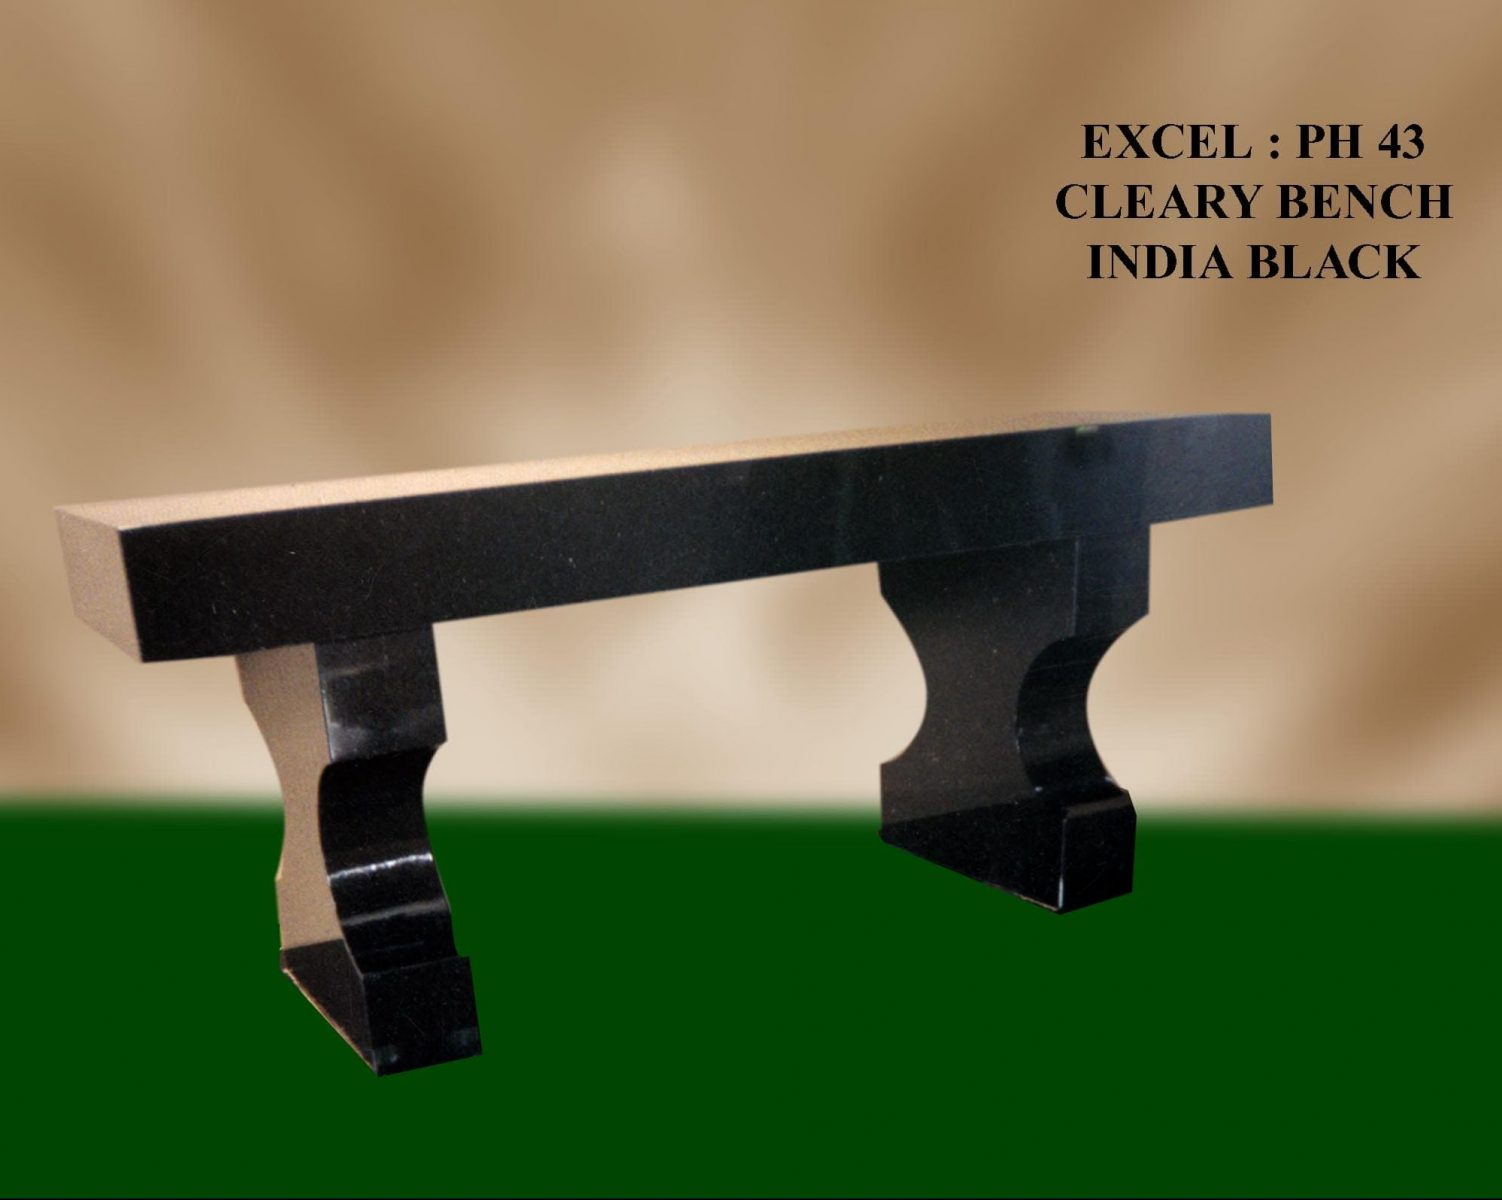 EG-43 / Jet Black / Curved Leg (Hourglass) Bench